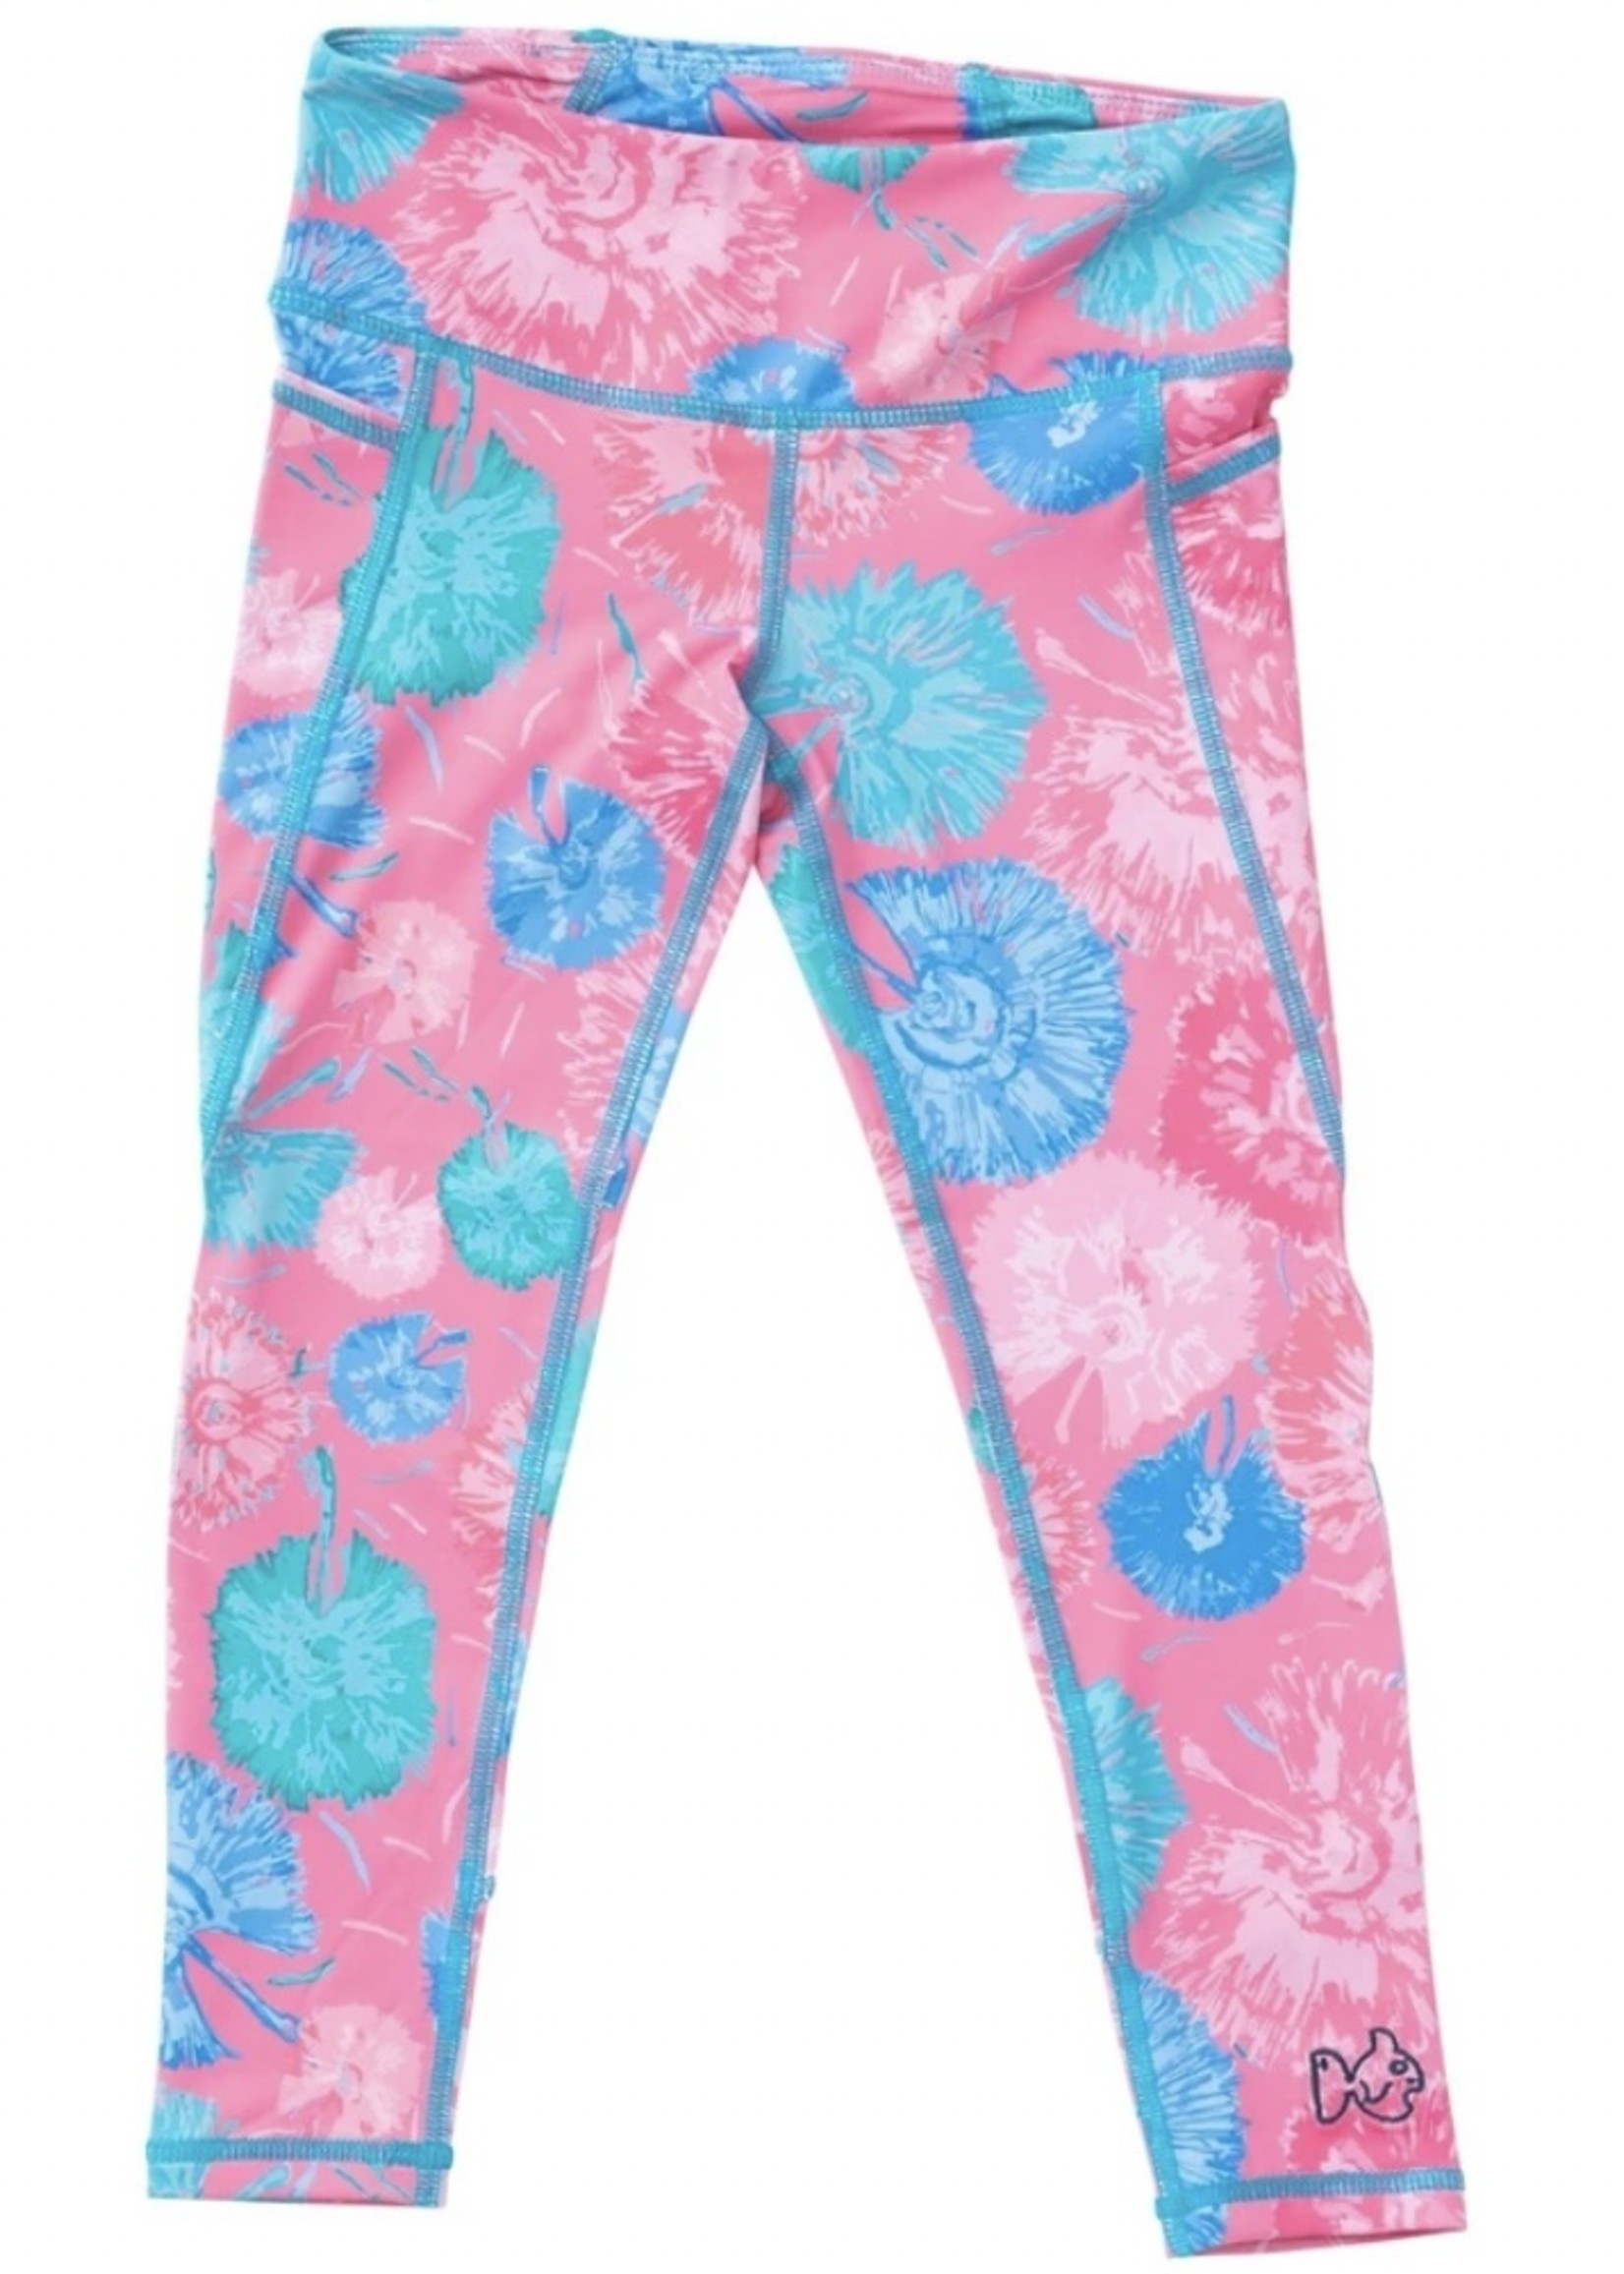 Girl's Athletic Legging - (pink print)